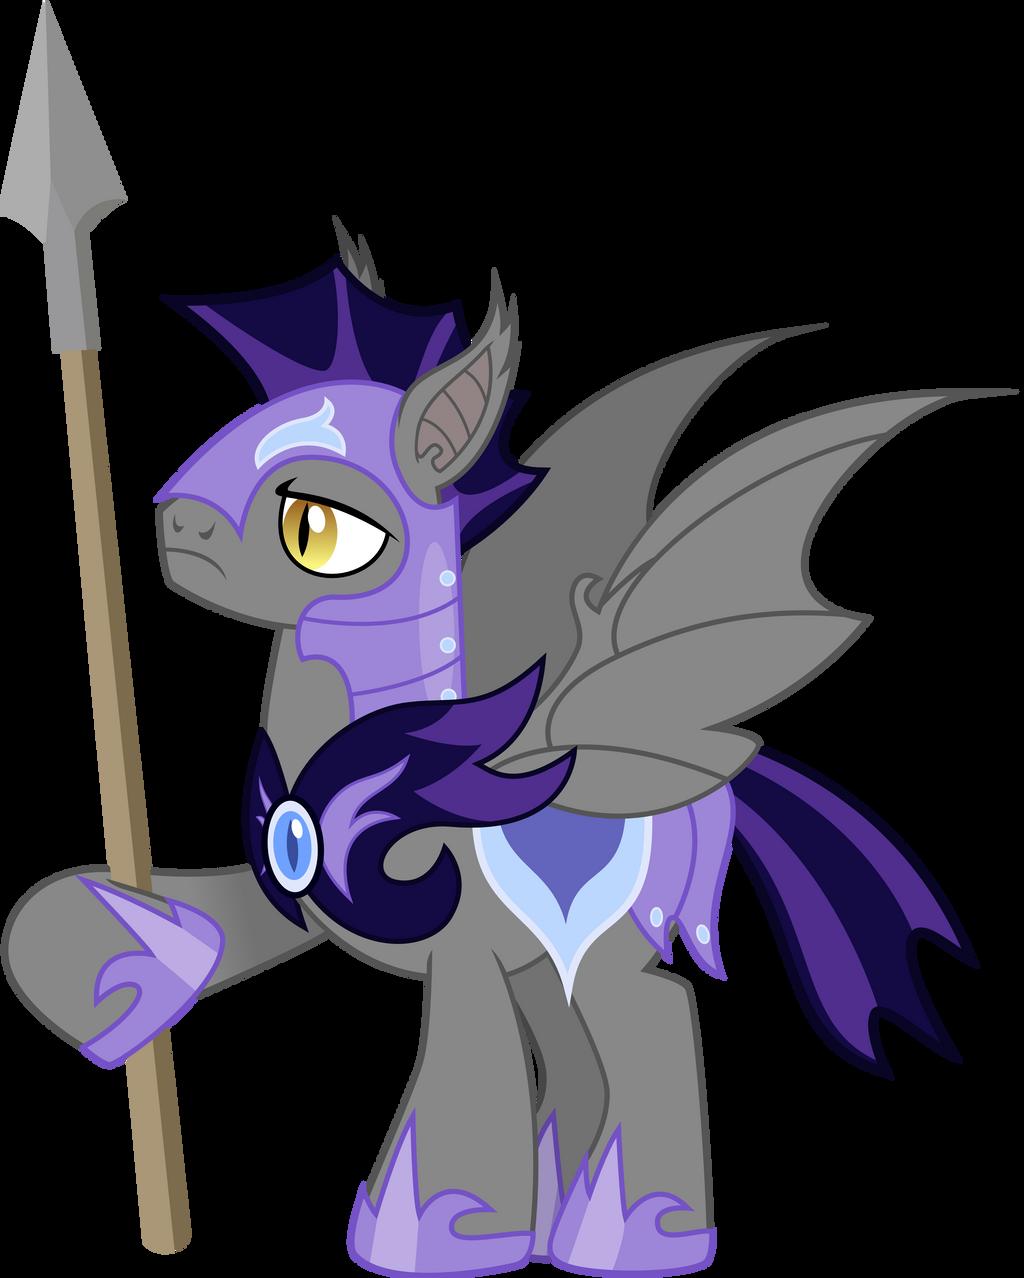 Lunar Bat Guard By Theshadowstone On Deviantart